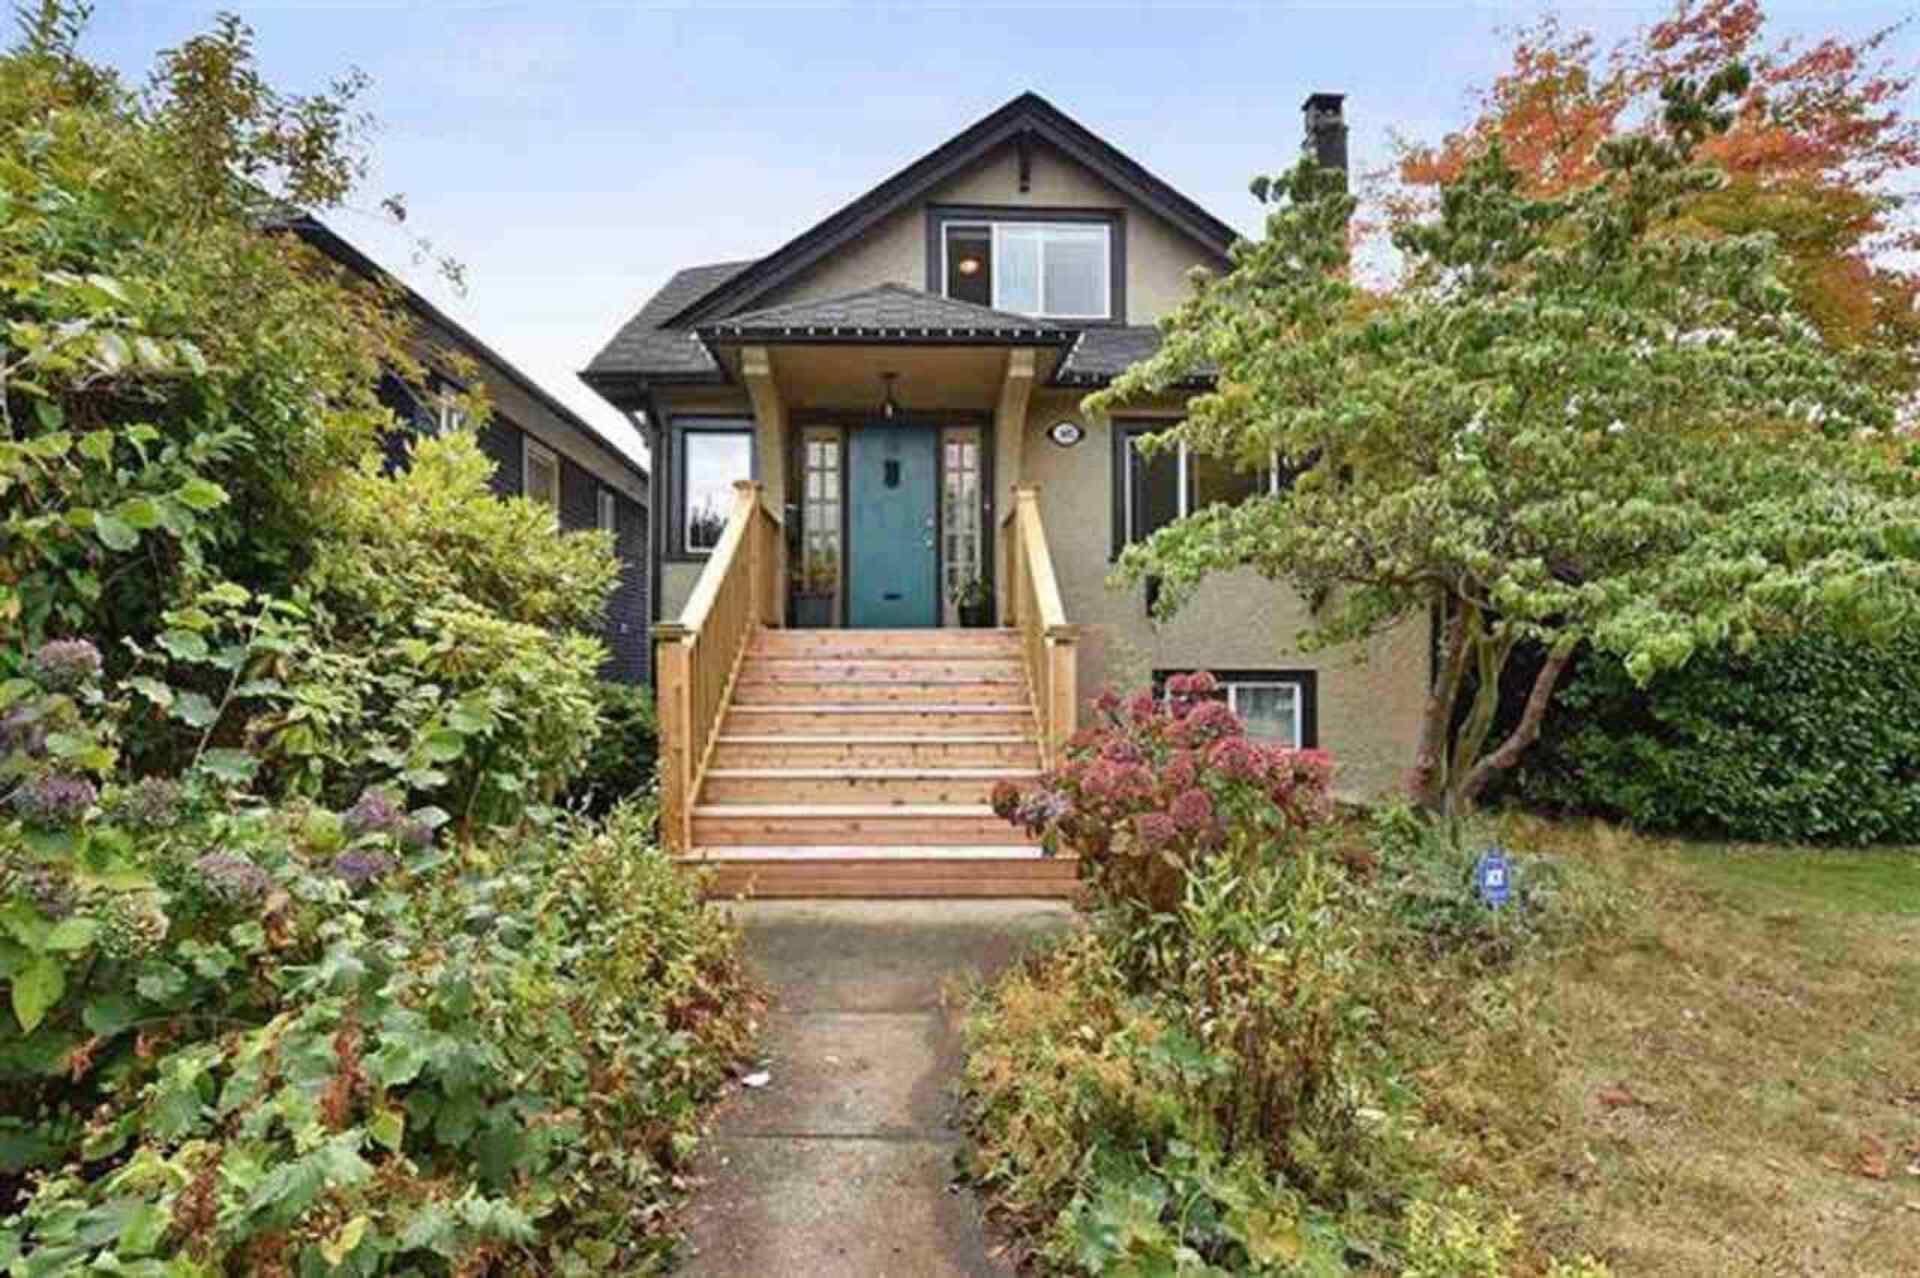 2602-dundas-street-hastings-sunrise-vancouver-east-01 at 2602 Dundas Street, Hastings Sunrise, Vancouver East